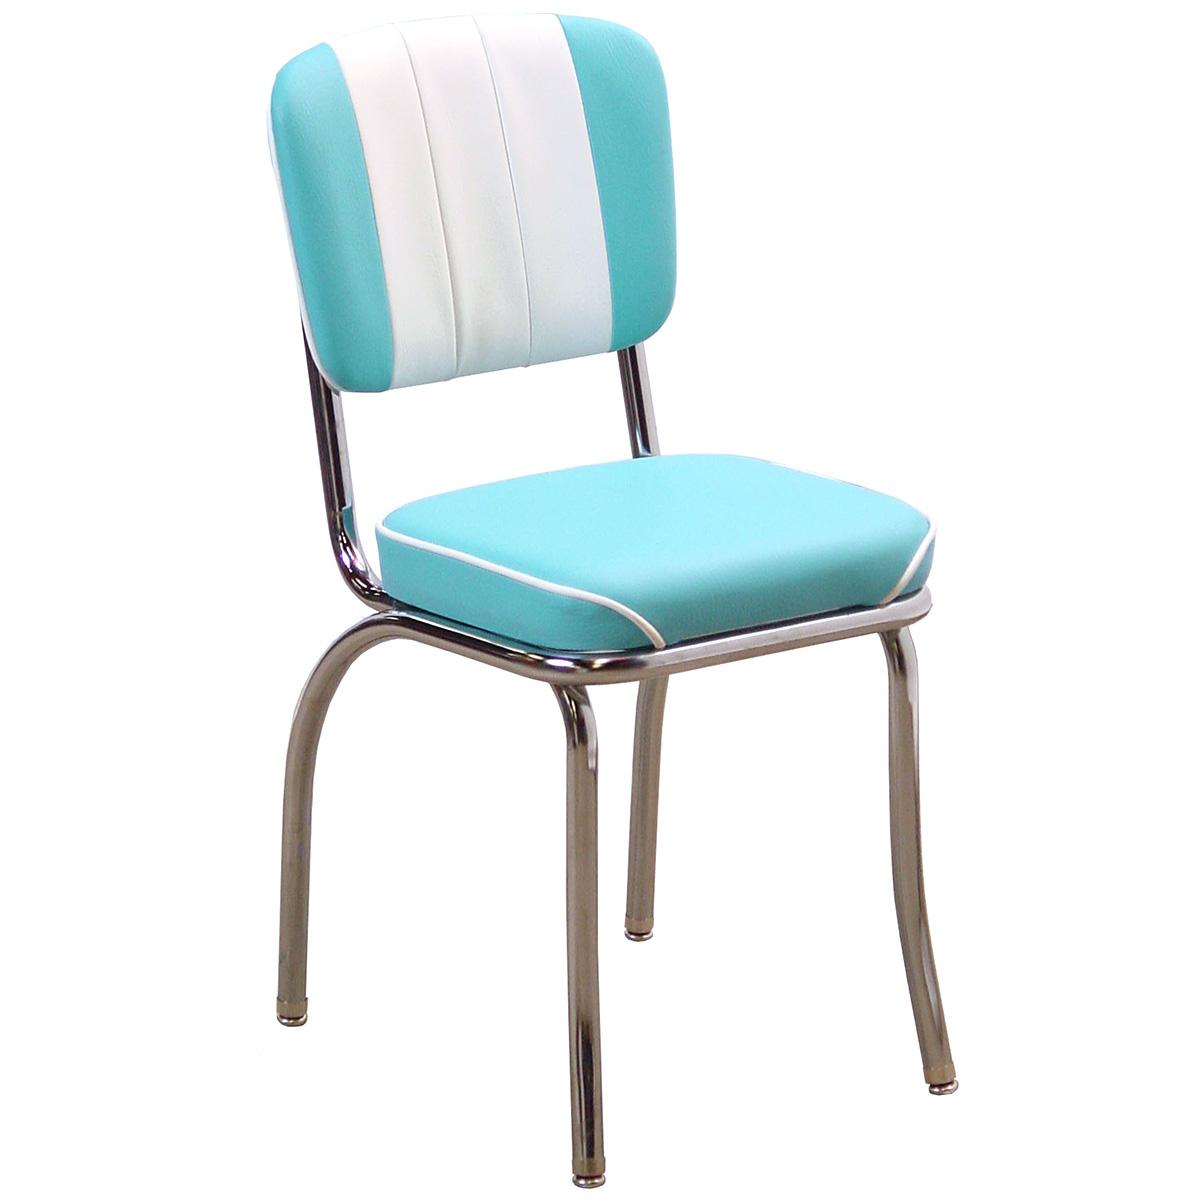 retro kitchen chairs photo - 2